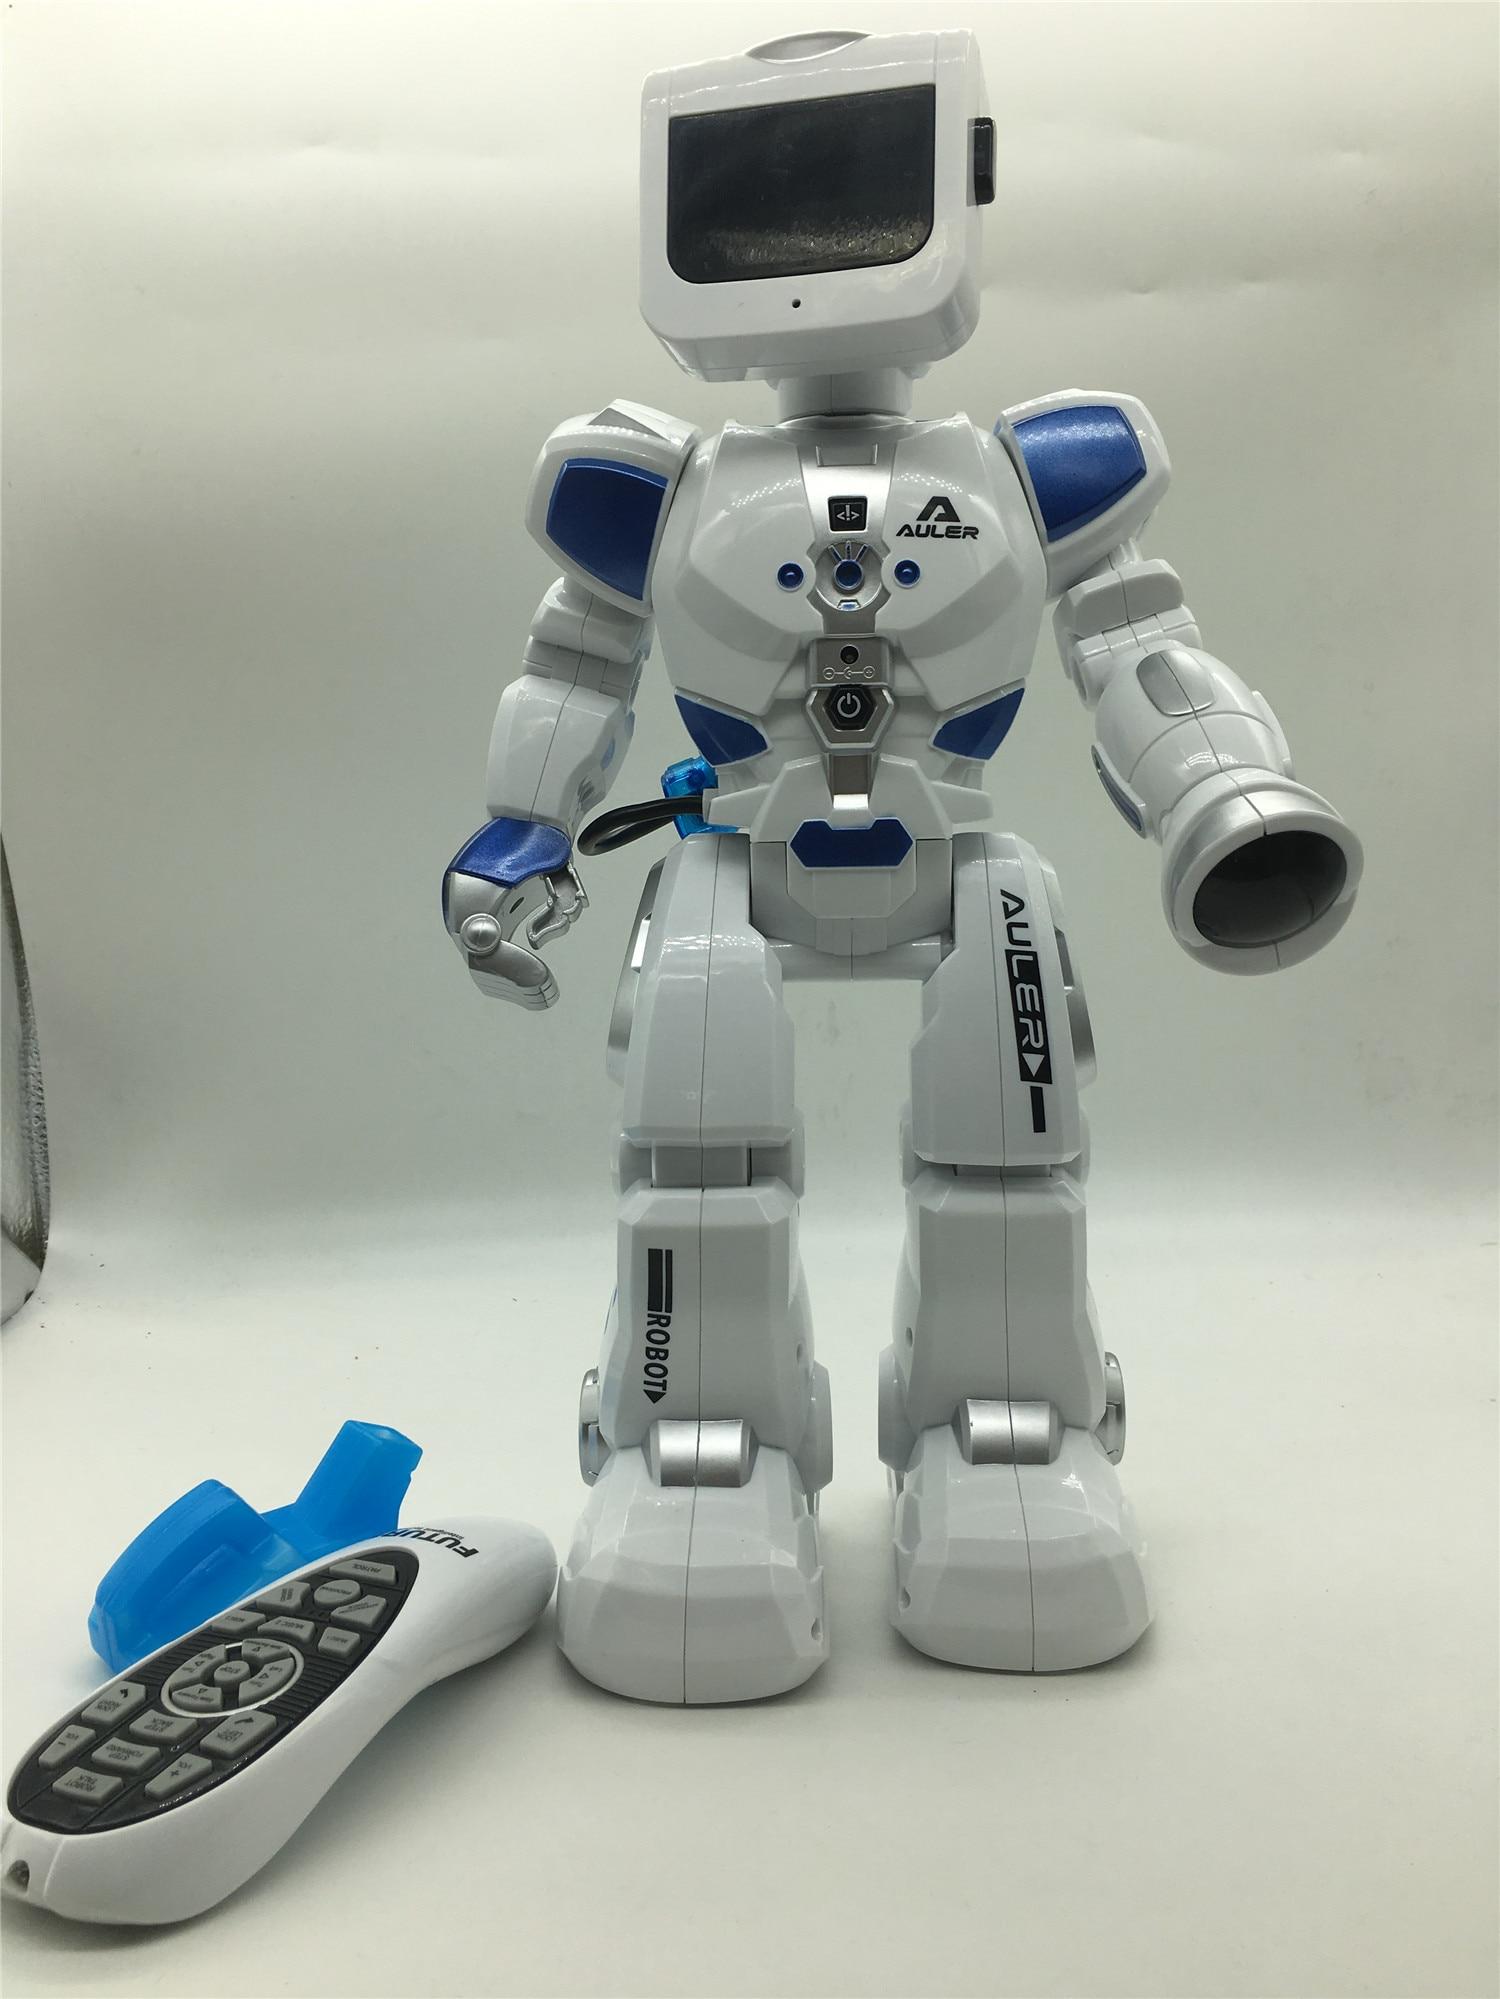 2017 New Generation of intelligent Water Driving RobotThe kid best birthday gift puzzle toys programming paul robot manipulators mathematics programming